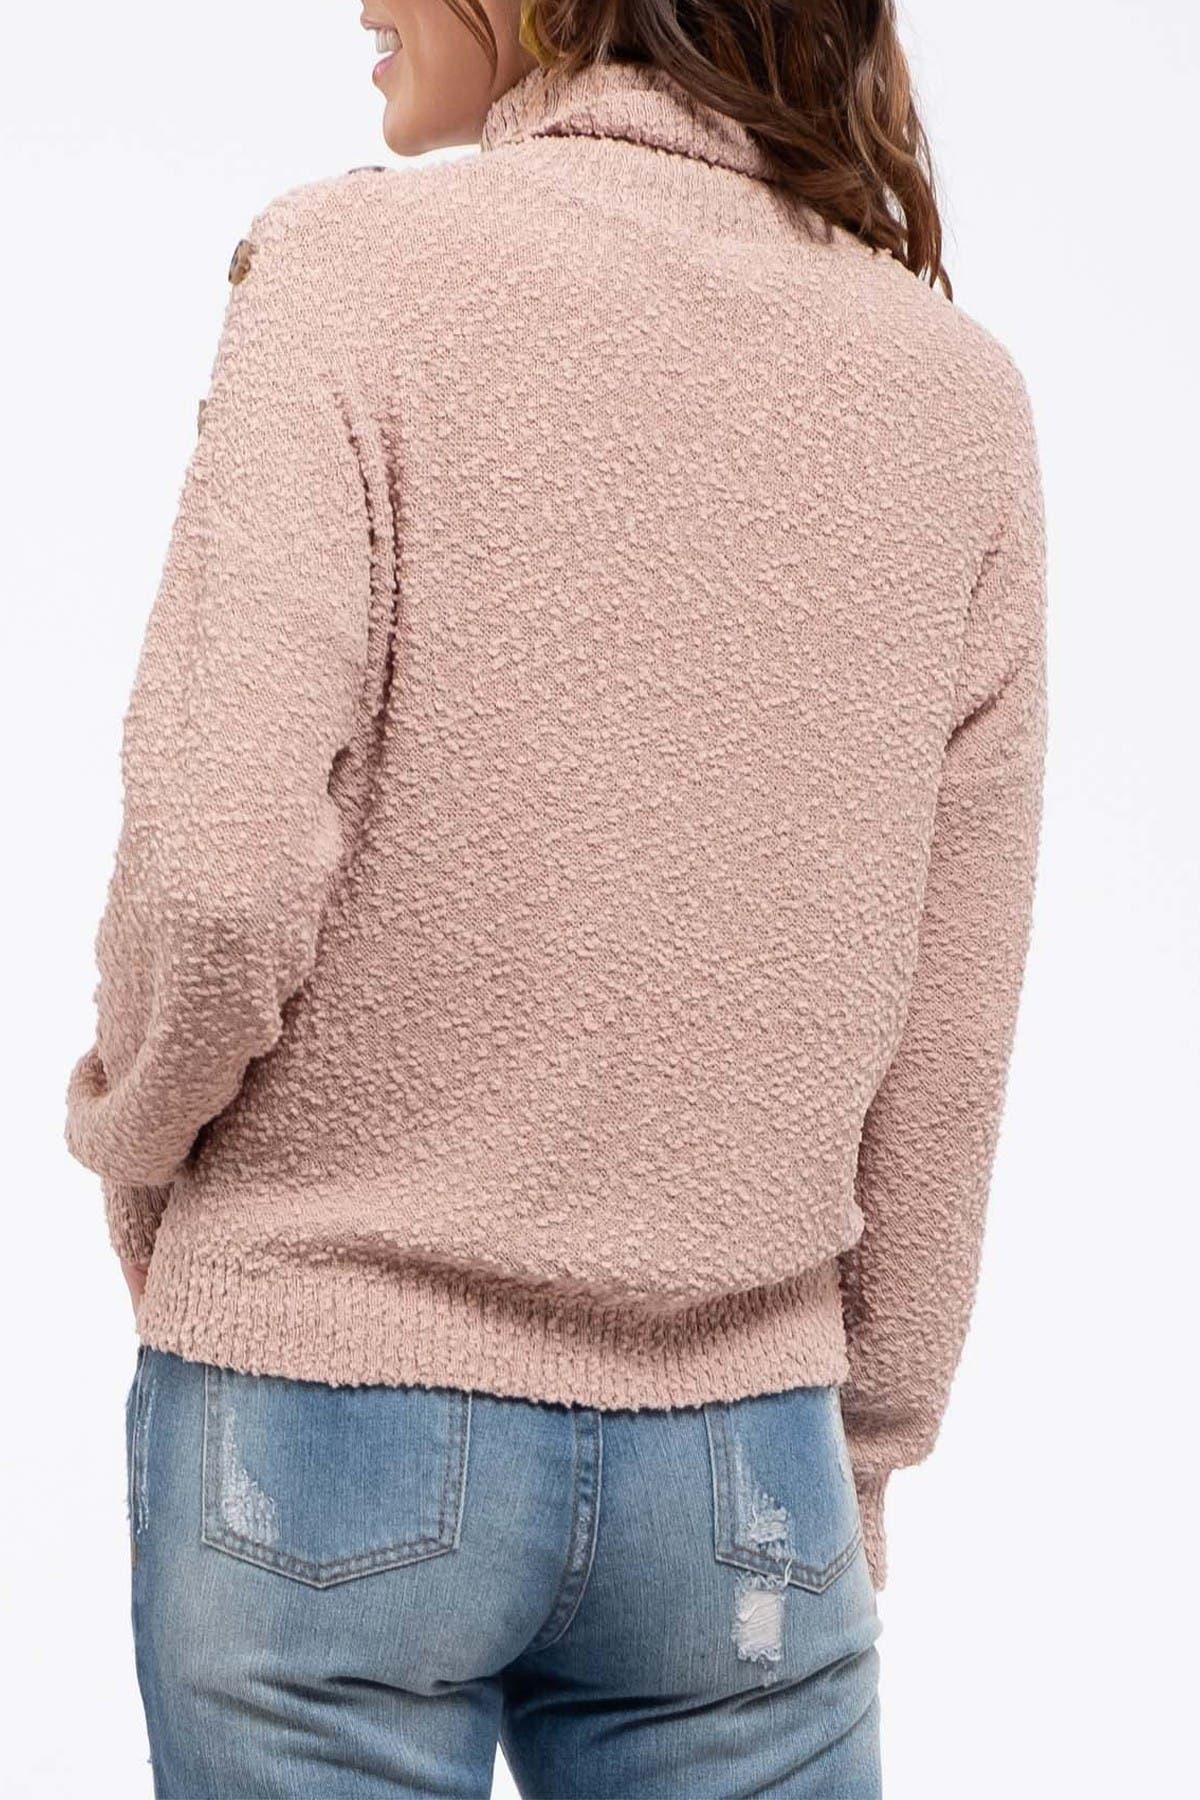 Image of Blu Pepper Button Turtleneck Sweater